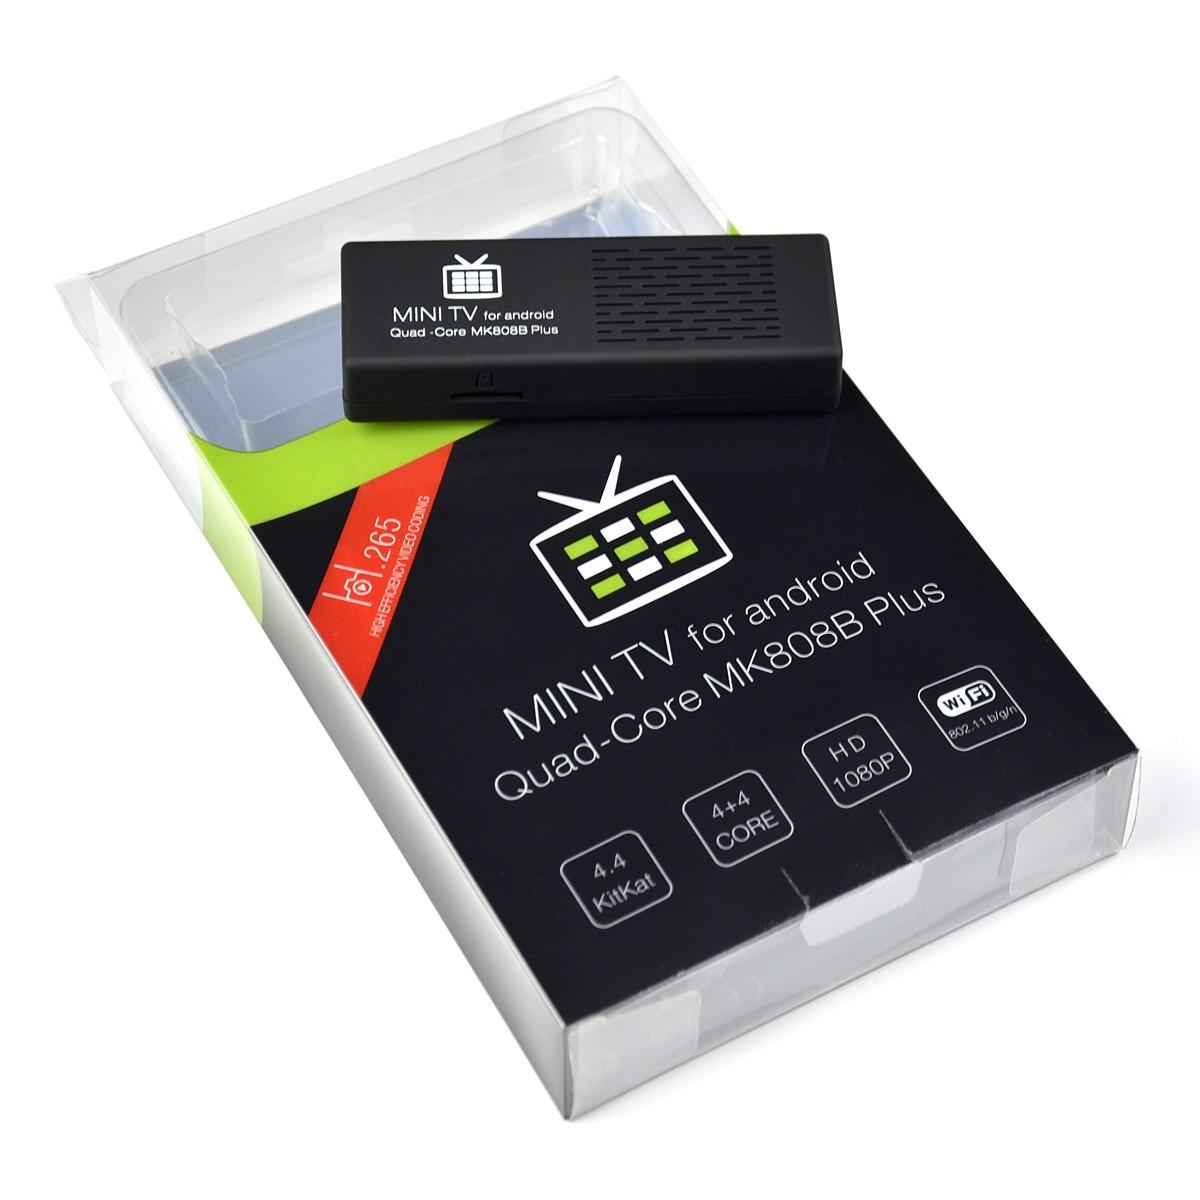 Mini PC Android Media Player MXQ S805 FullHD Android 4.4 Quad Core